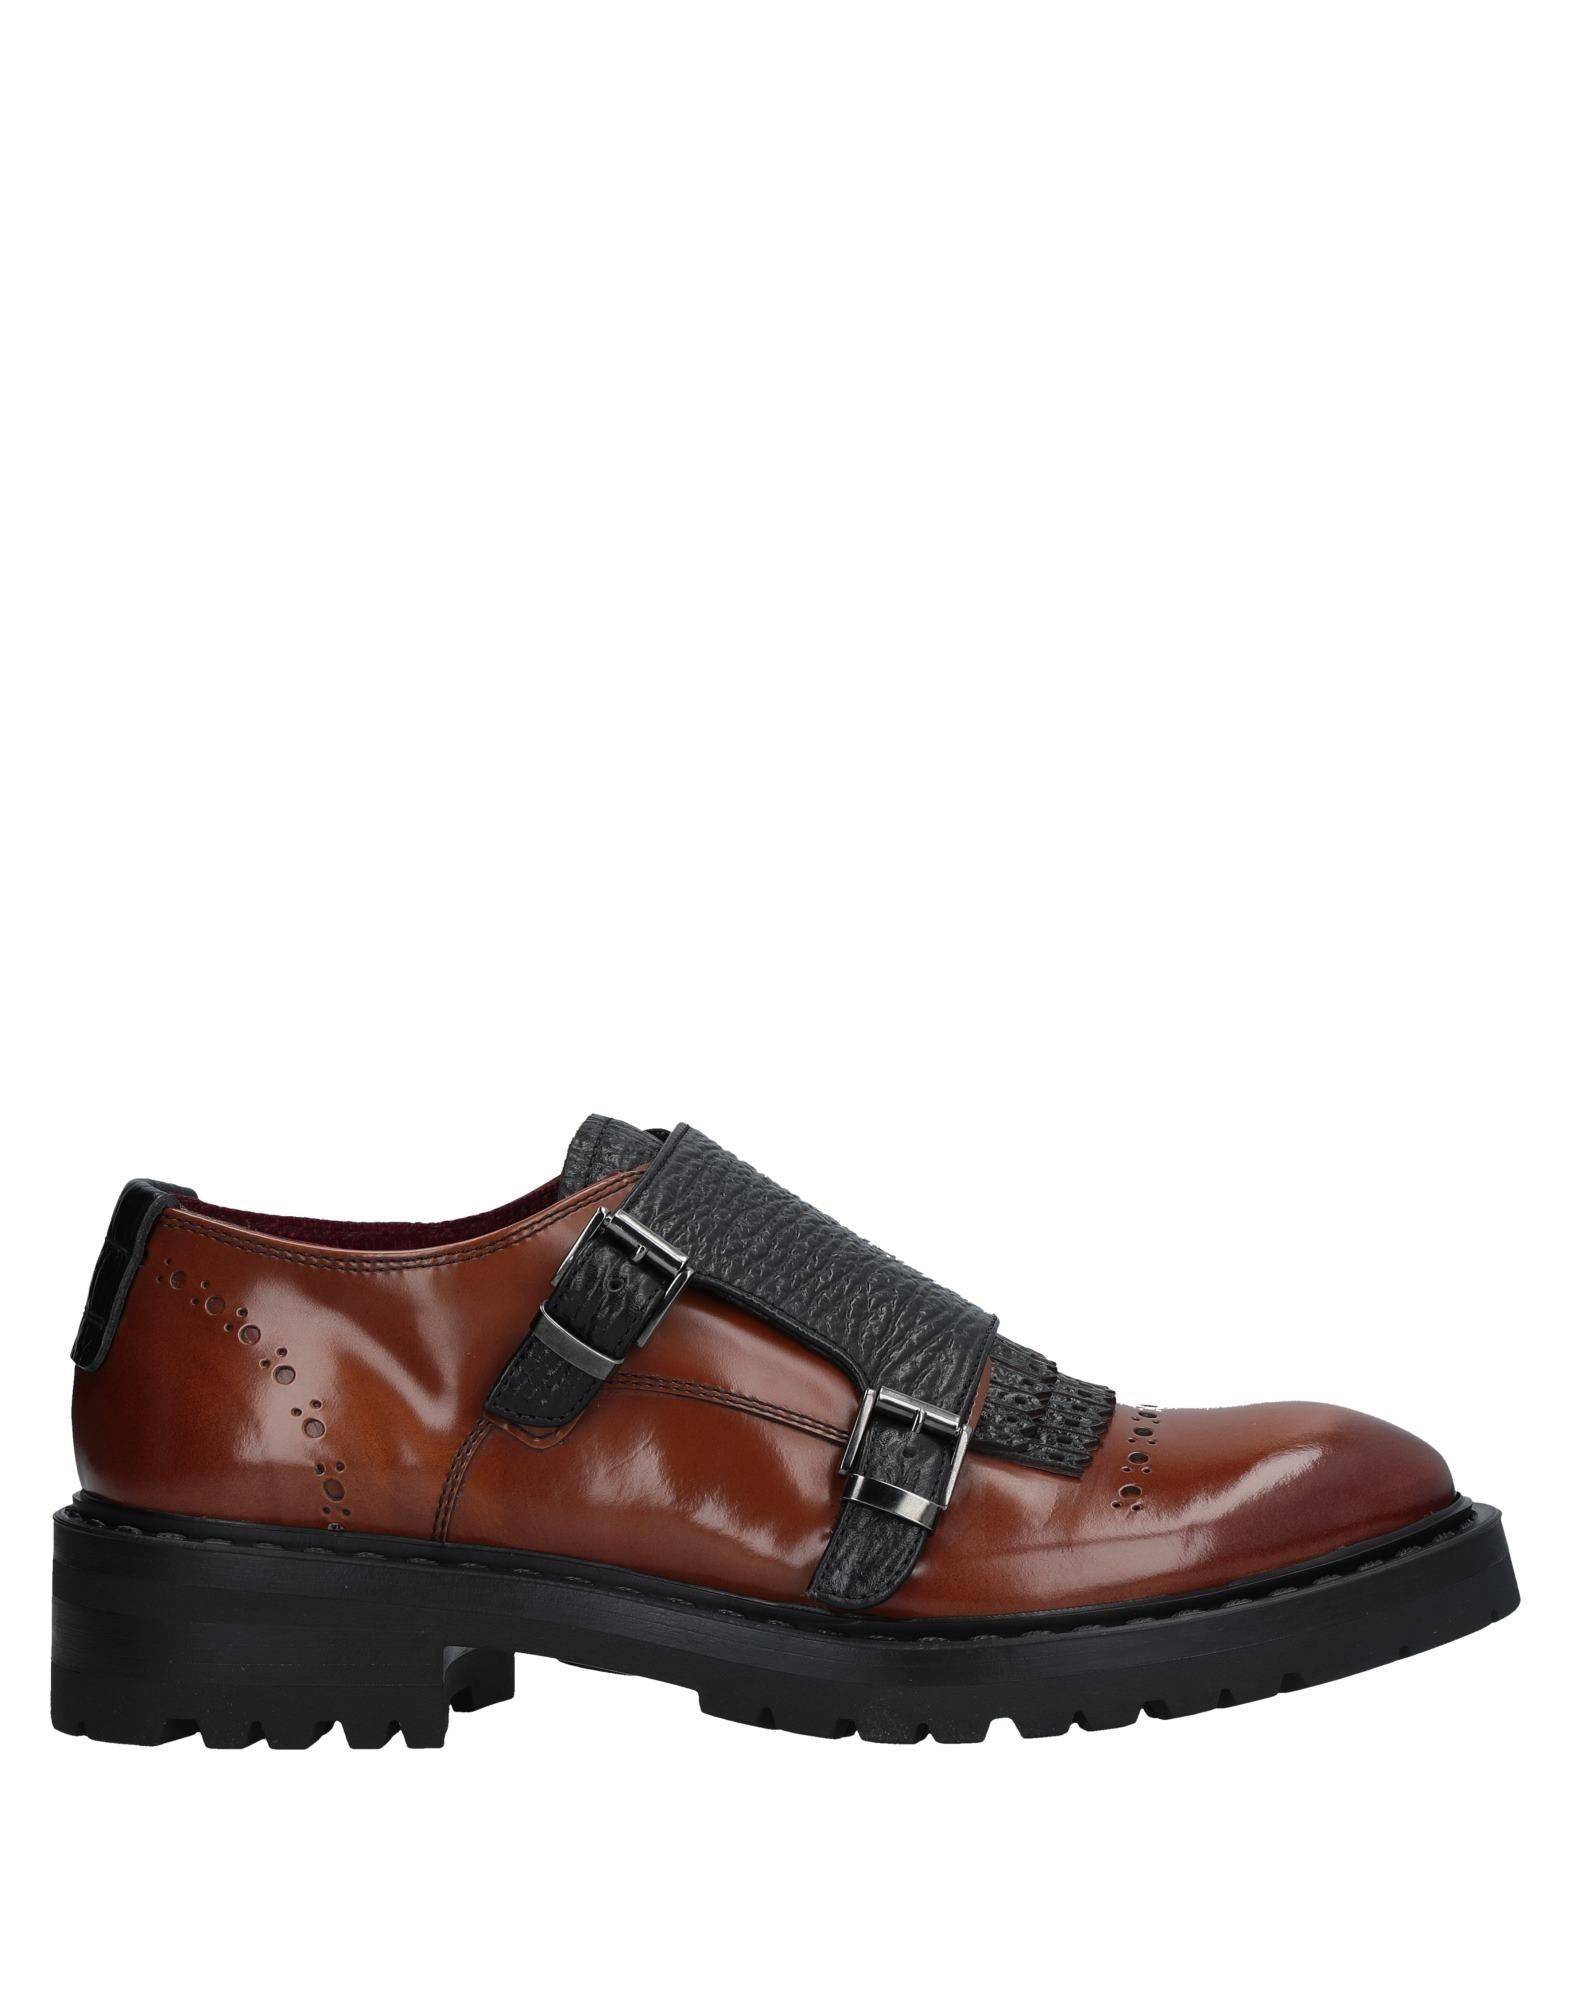 Haltbare Mode billige Schuhe Barracuda Mokassins Damen  11536186TJ Heiße Schuhe